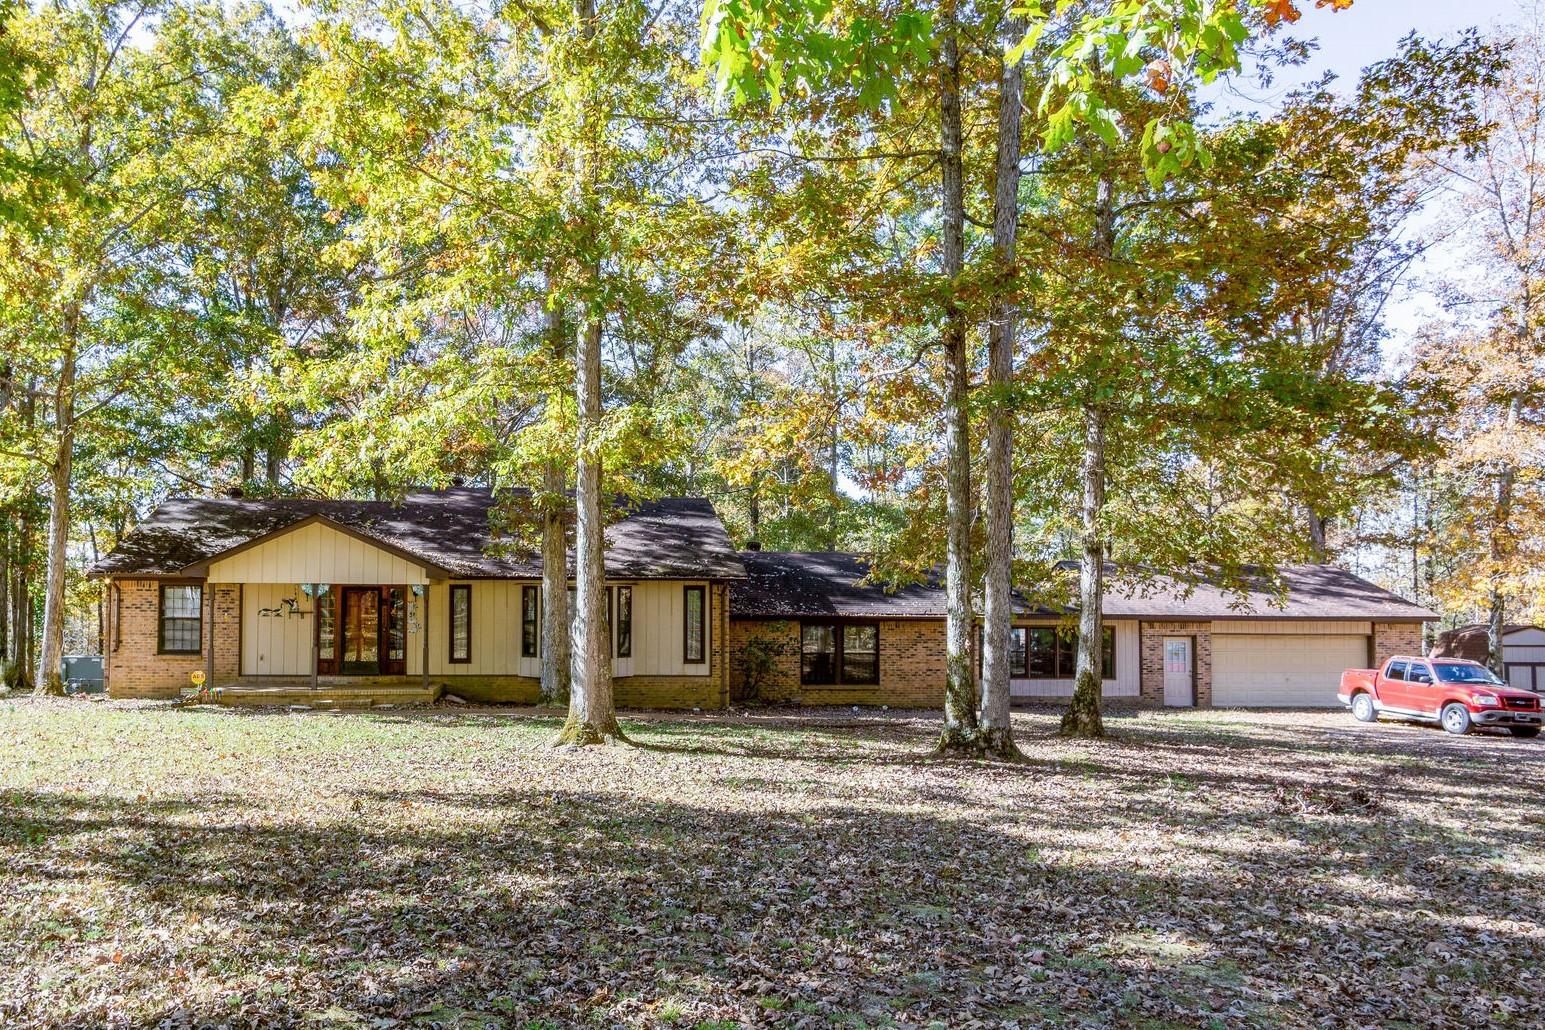 246 Troy Ln, Hohenwald, TN 38462 - Hohenwald, TN real estate listing